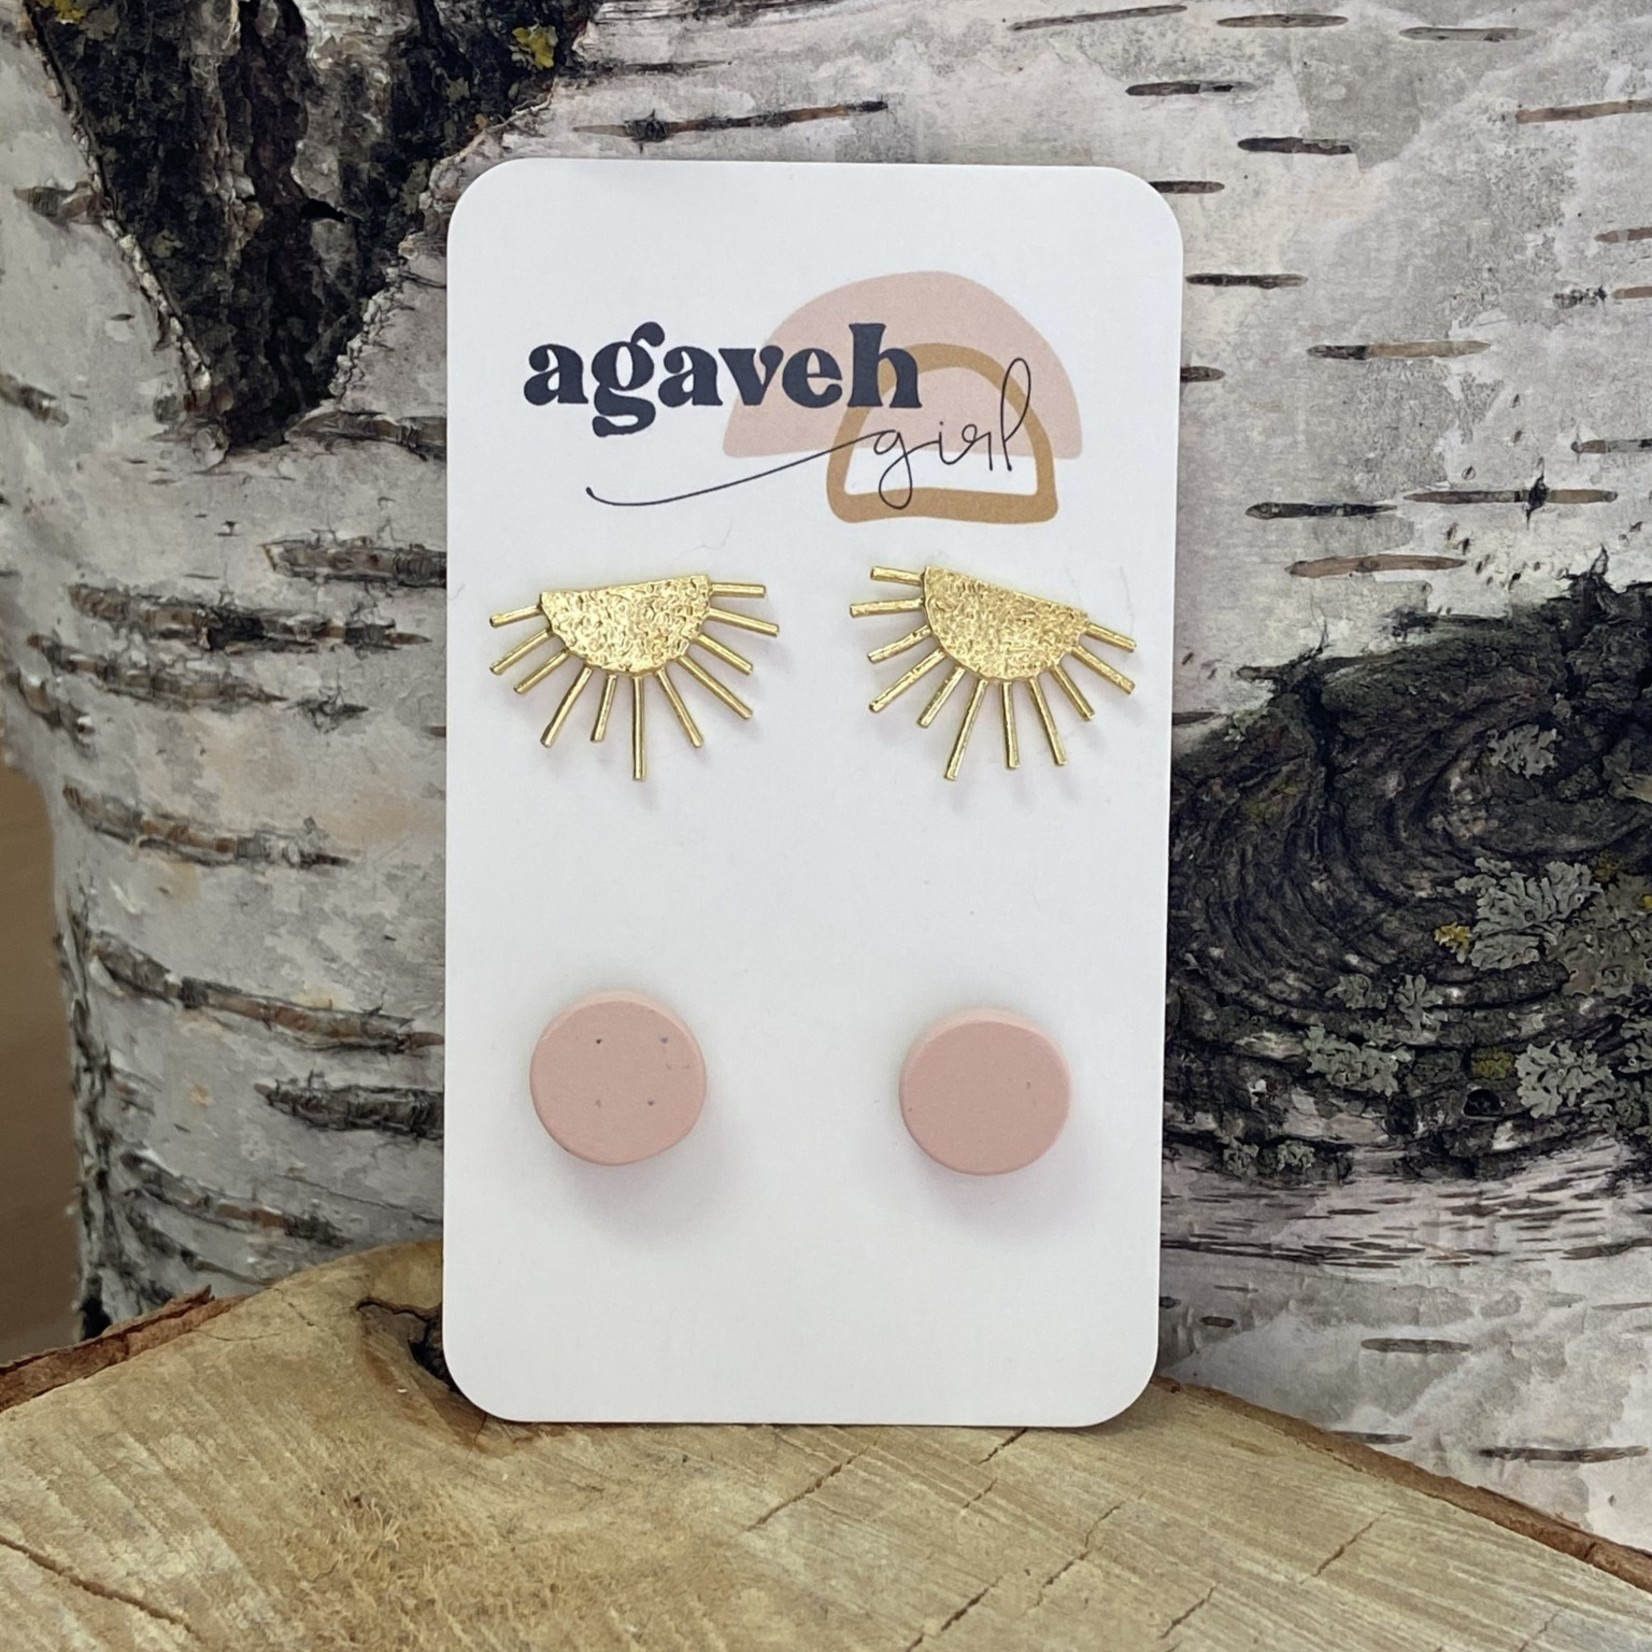 agaveh girl Blush & Sunrise Earring Duo